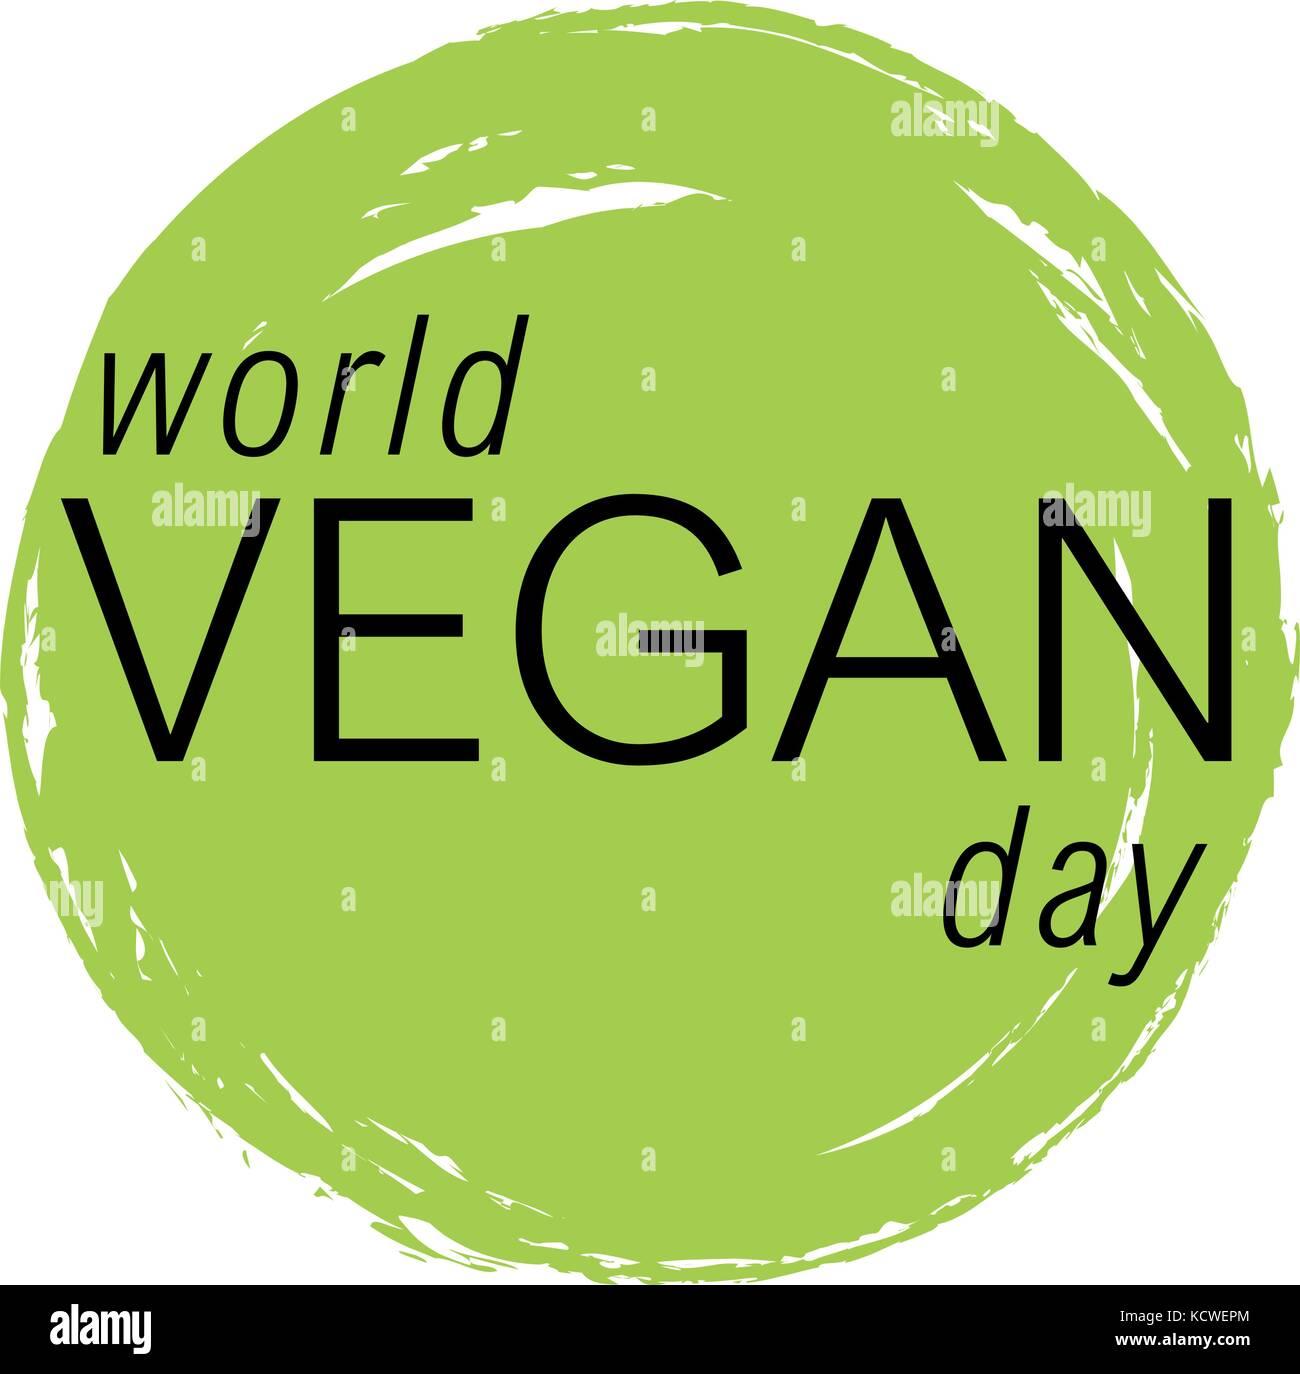 Vegan day vector colorfull illustration. - Stock Image